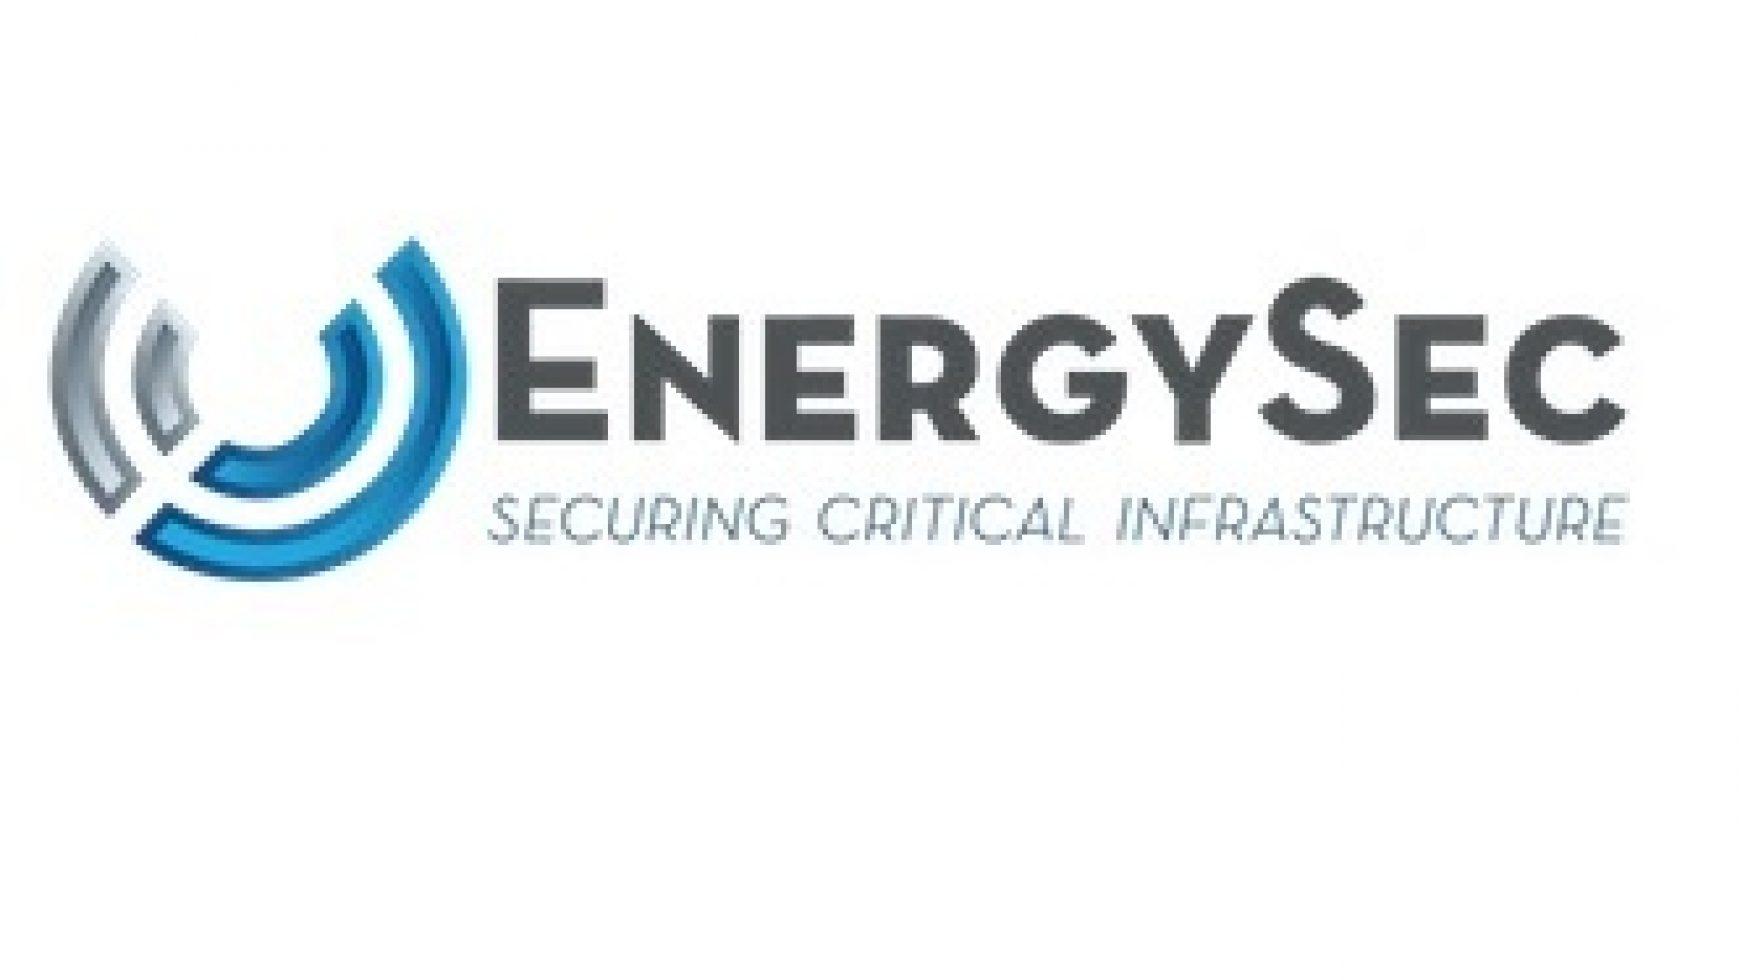 EnergySec